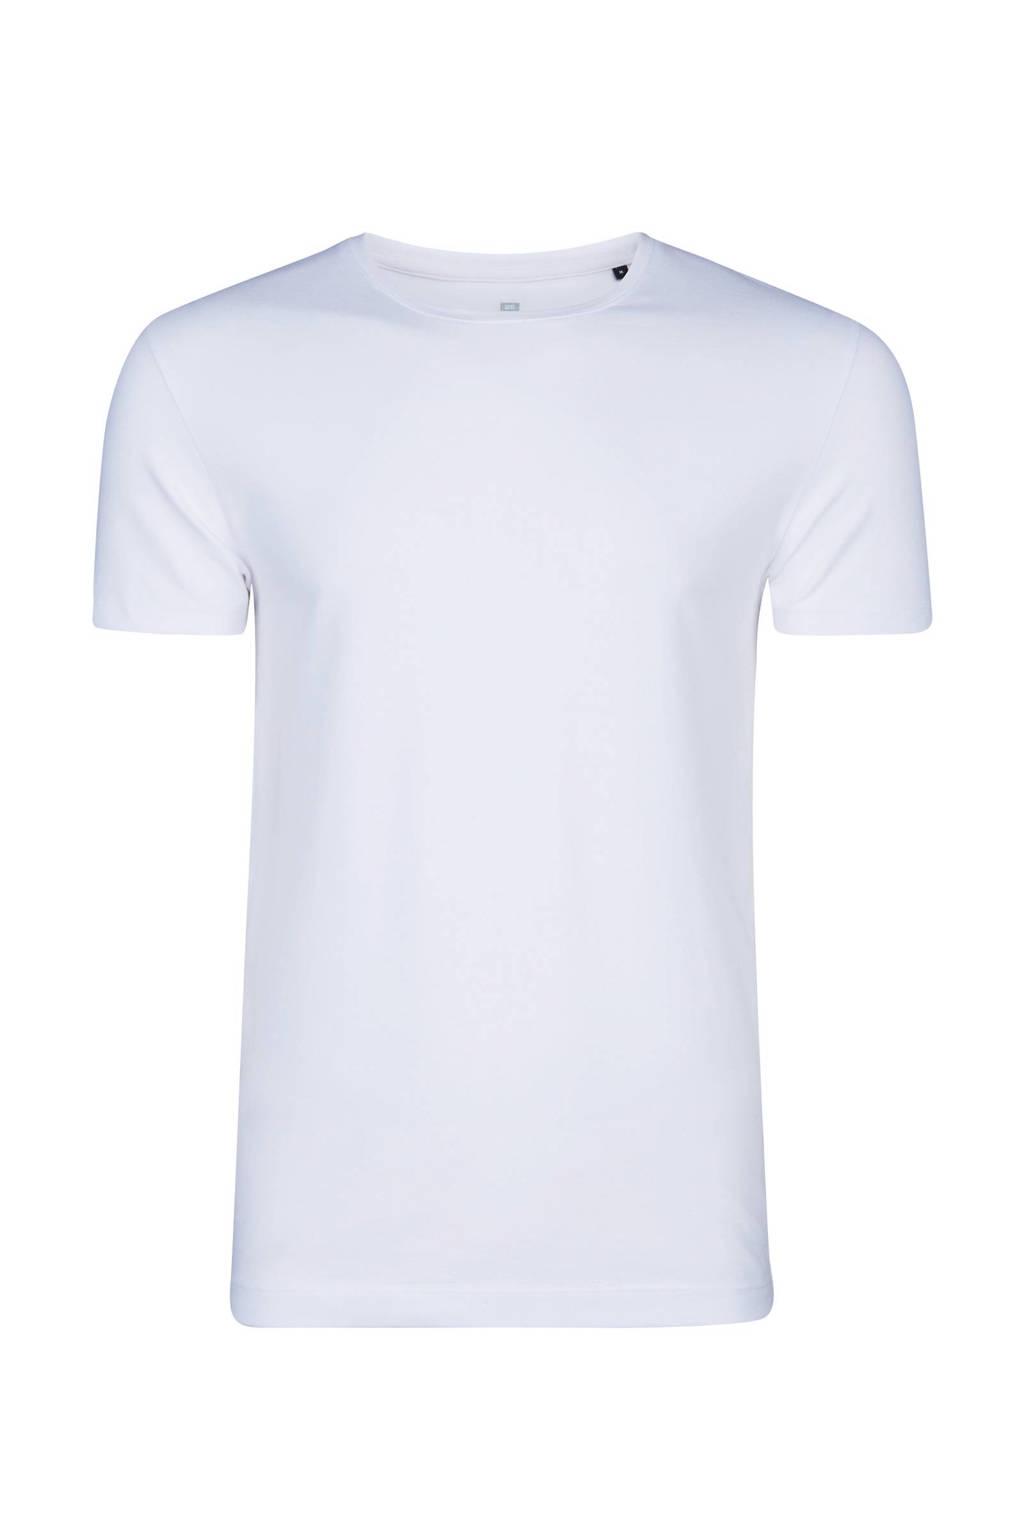 WE Fashion T-shirt, Wit